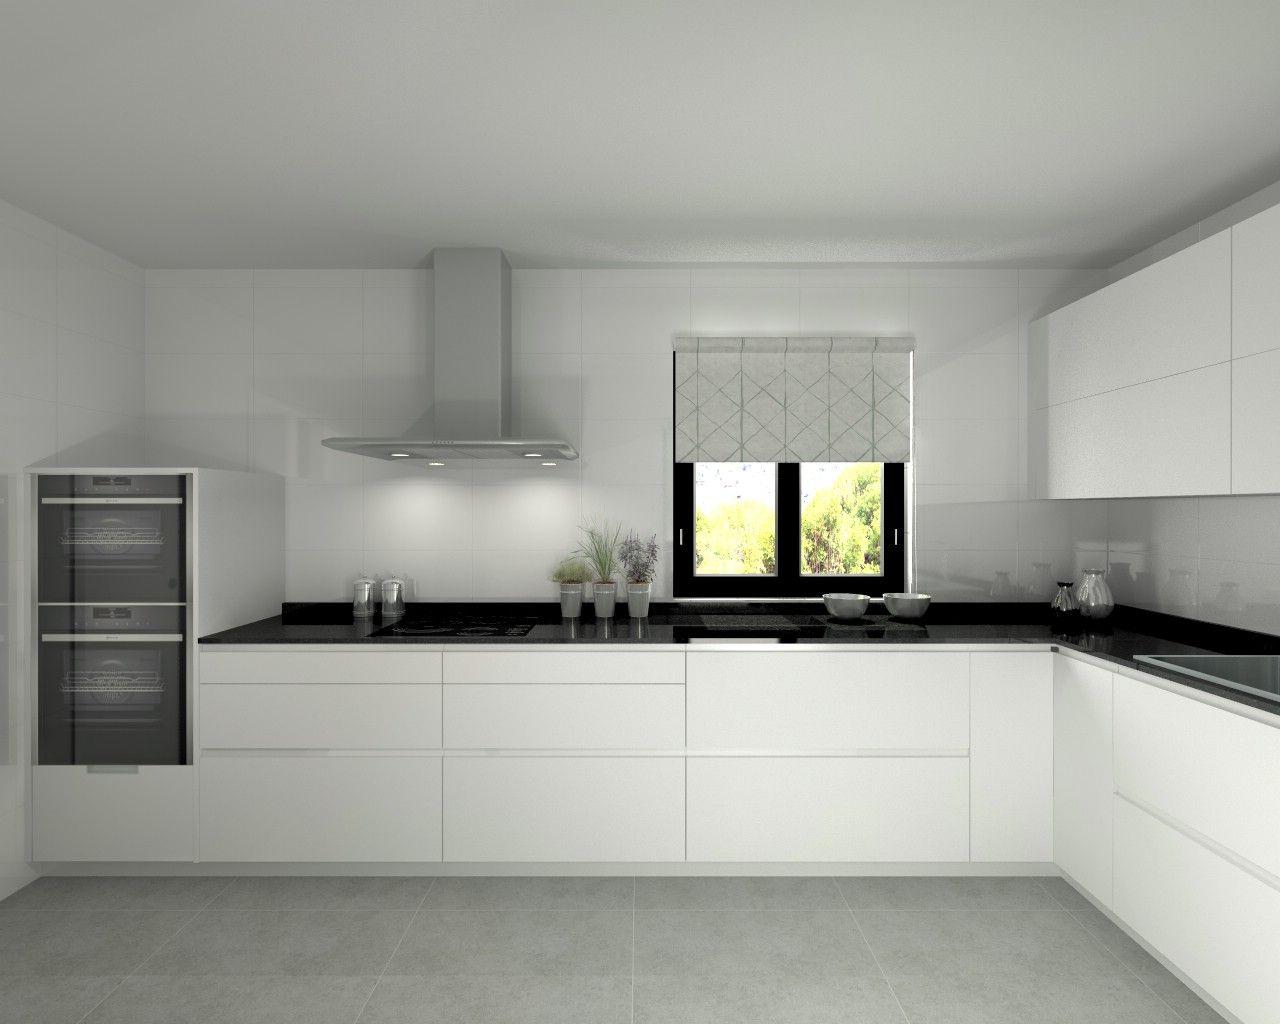 Modelo line l blanco seda encimera granito negro - Cocinas de granito ...